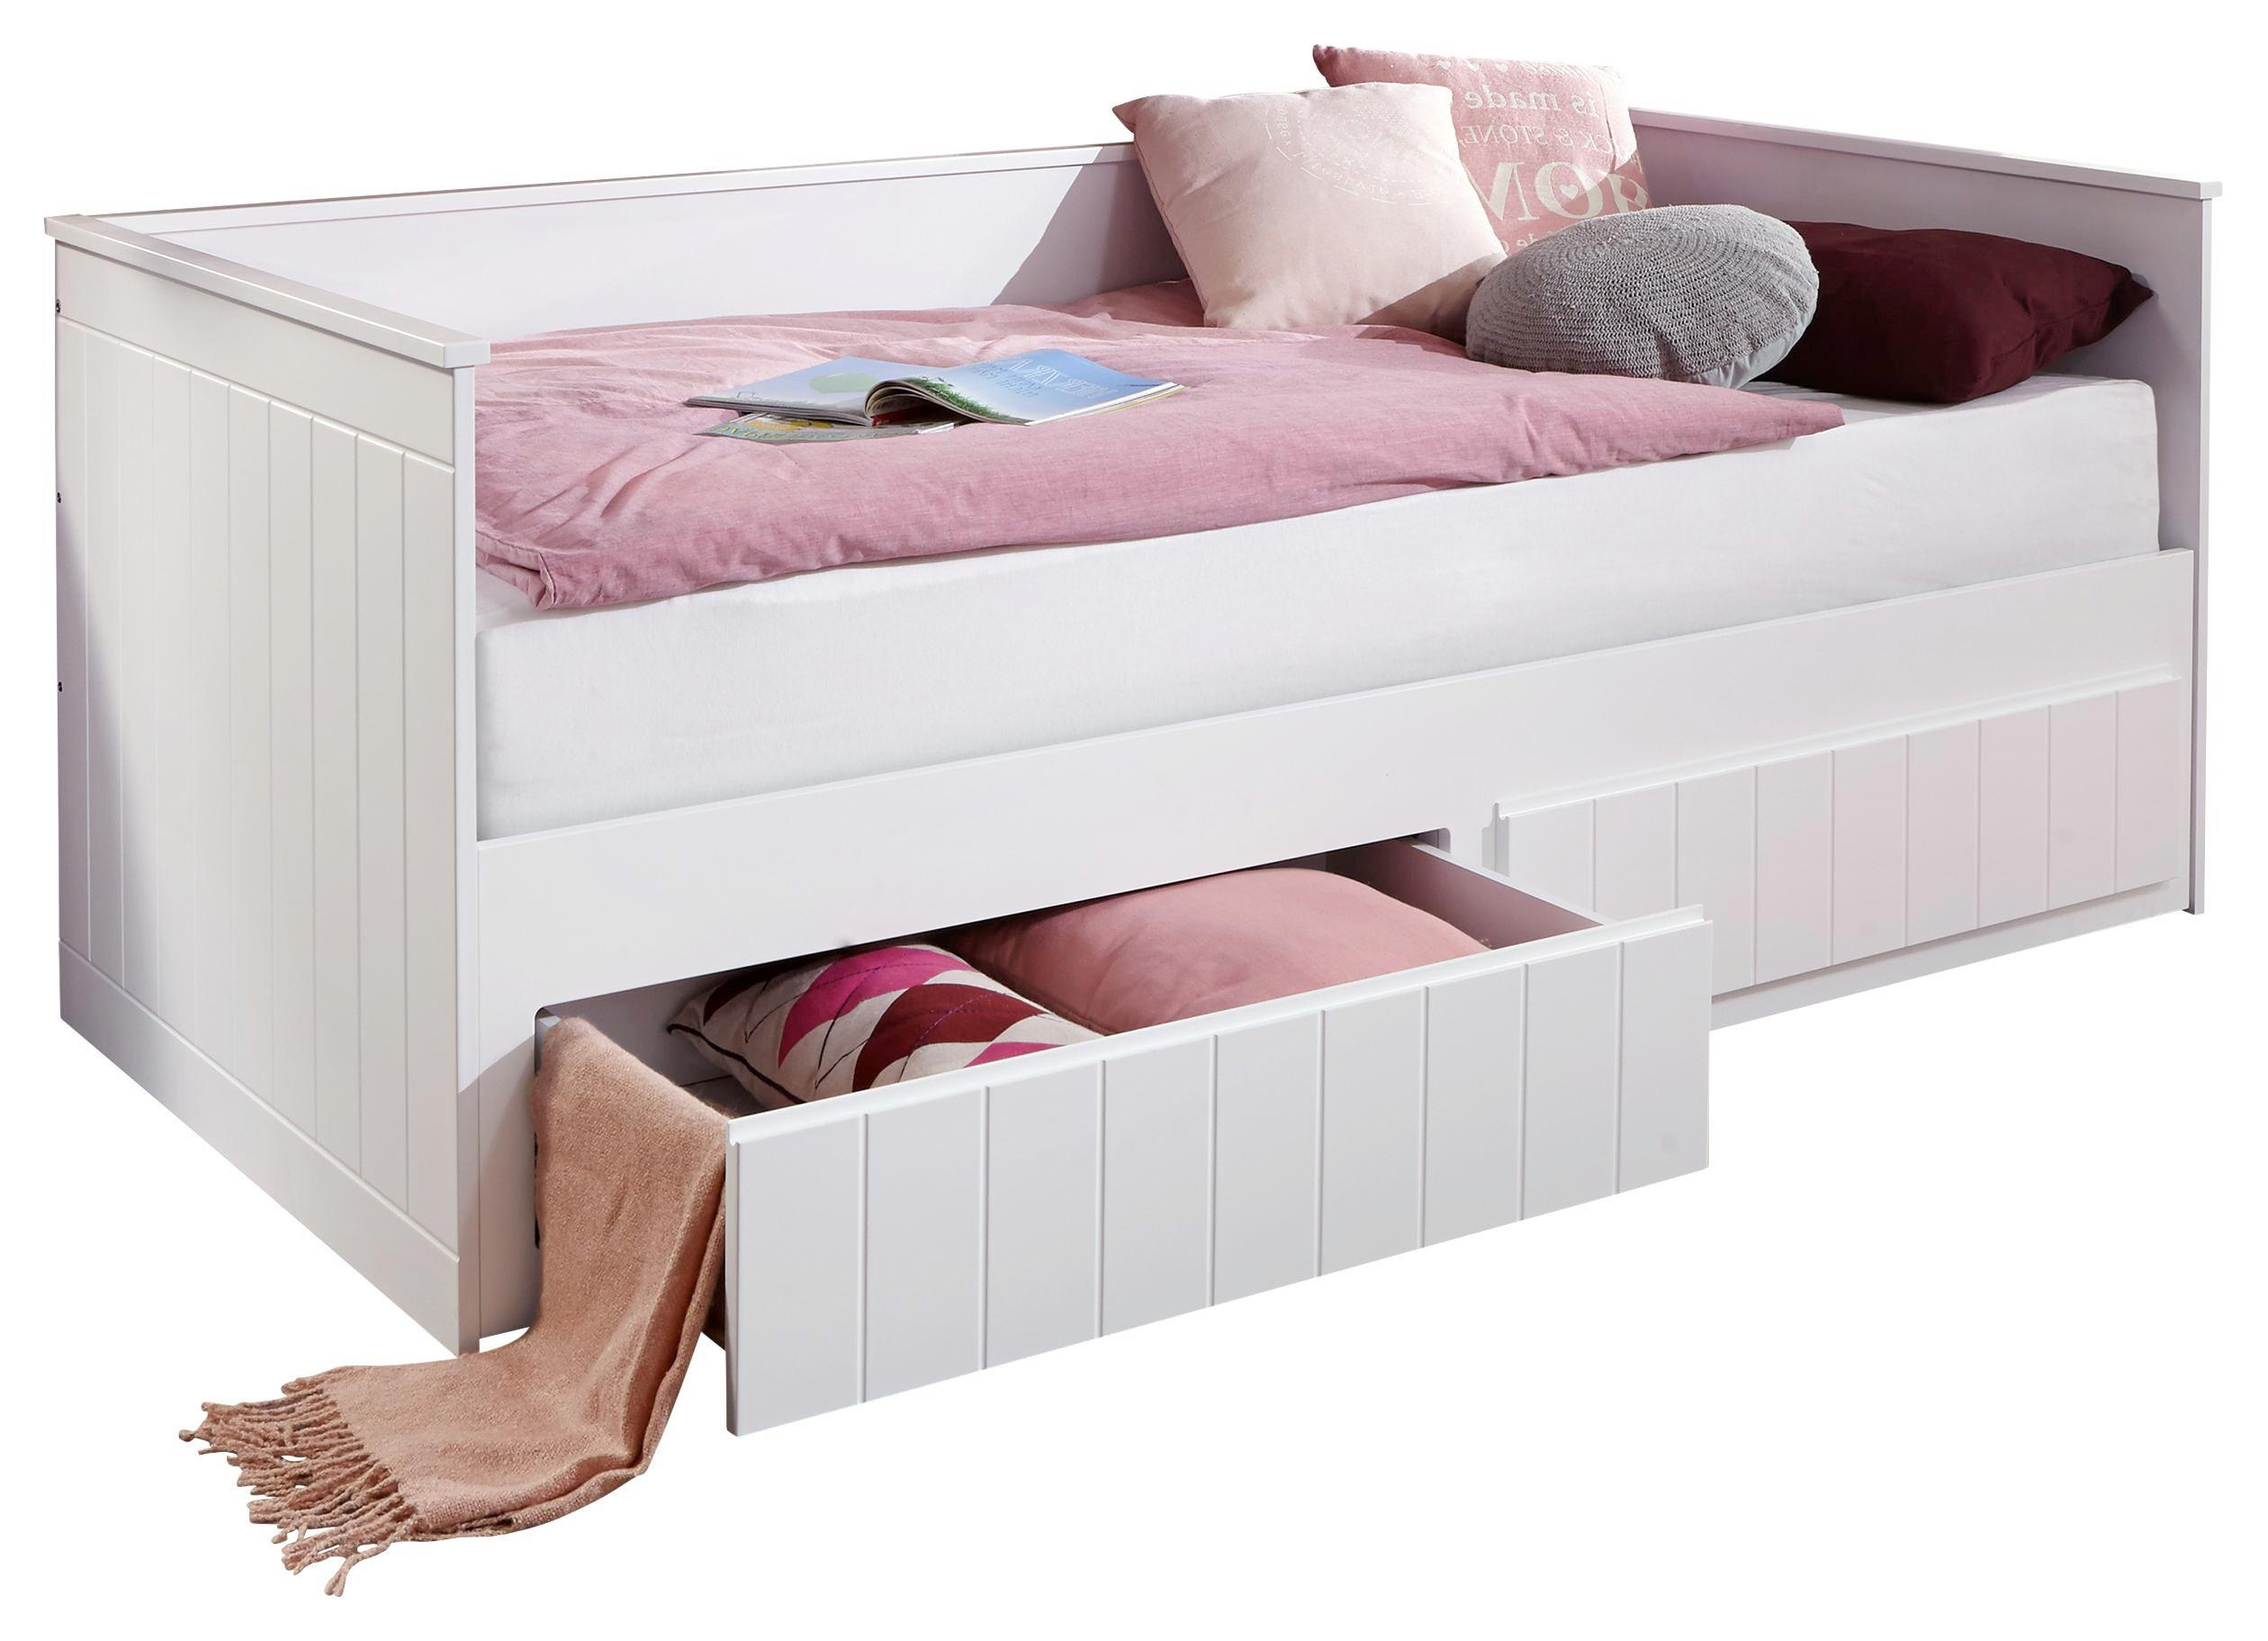 kinderzimmer mudchen weiss 2. Black Bedroom Furniture Sets. Home Design Ideas